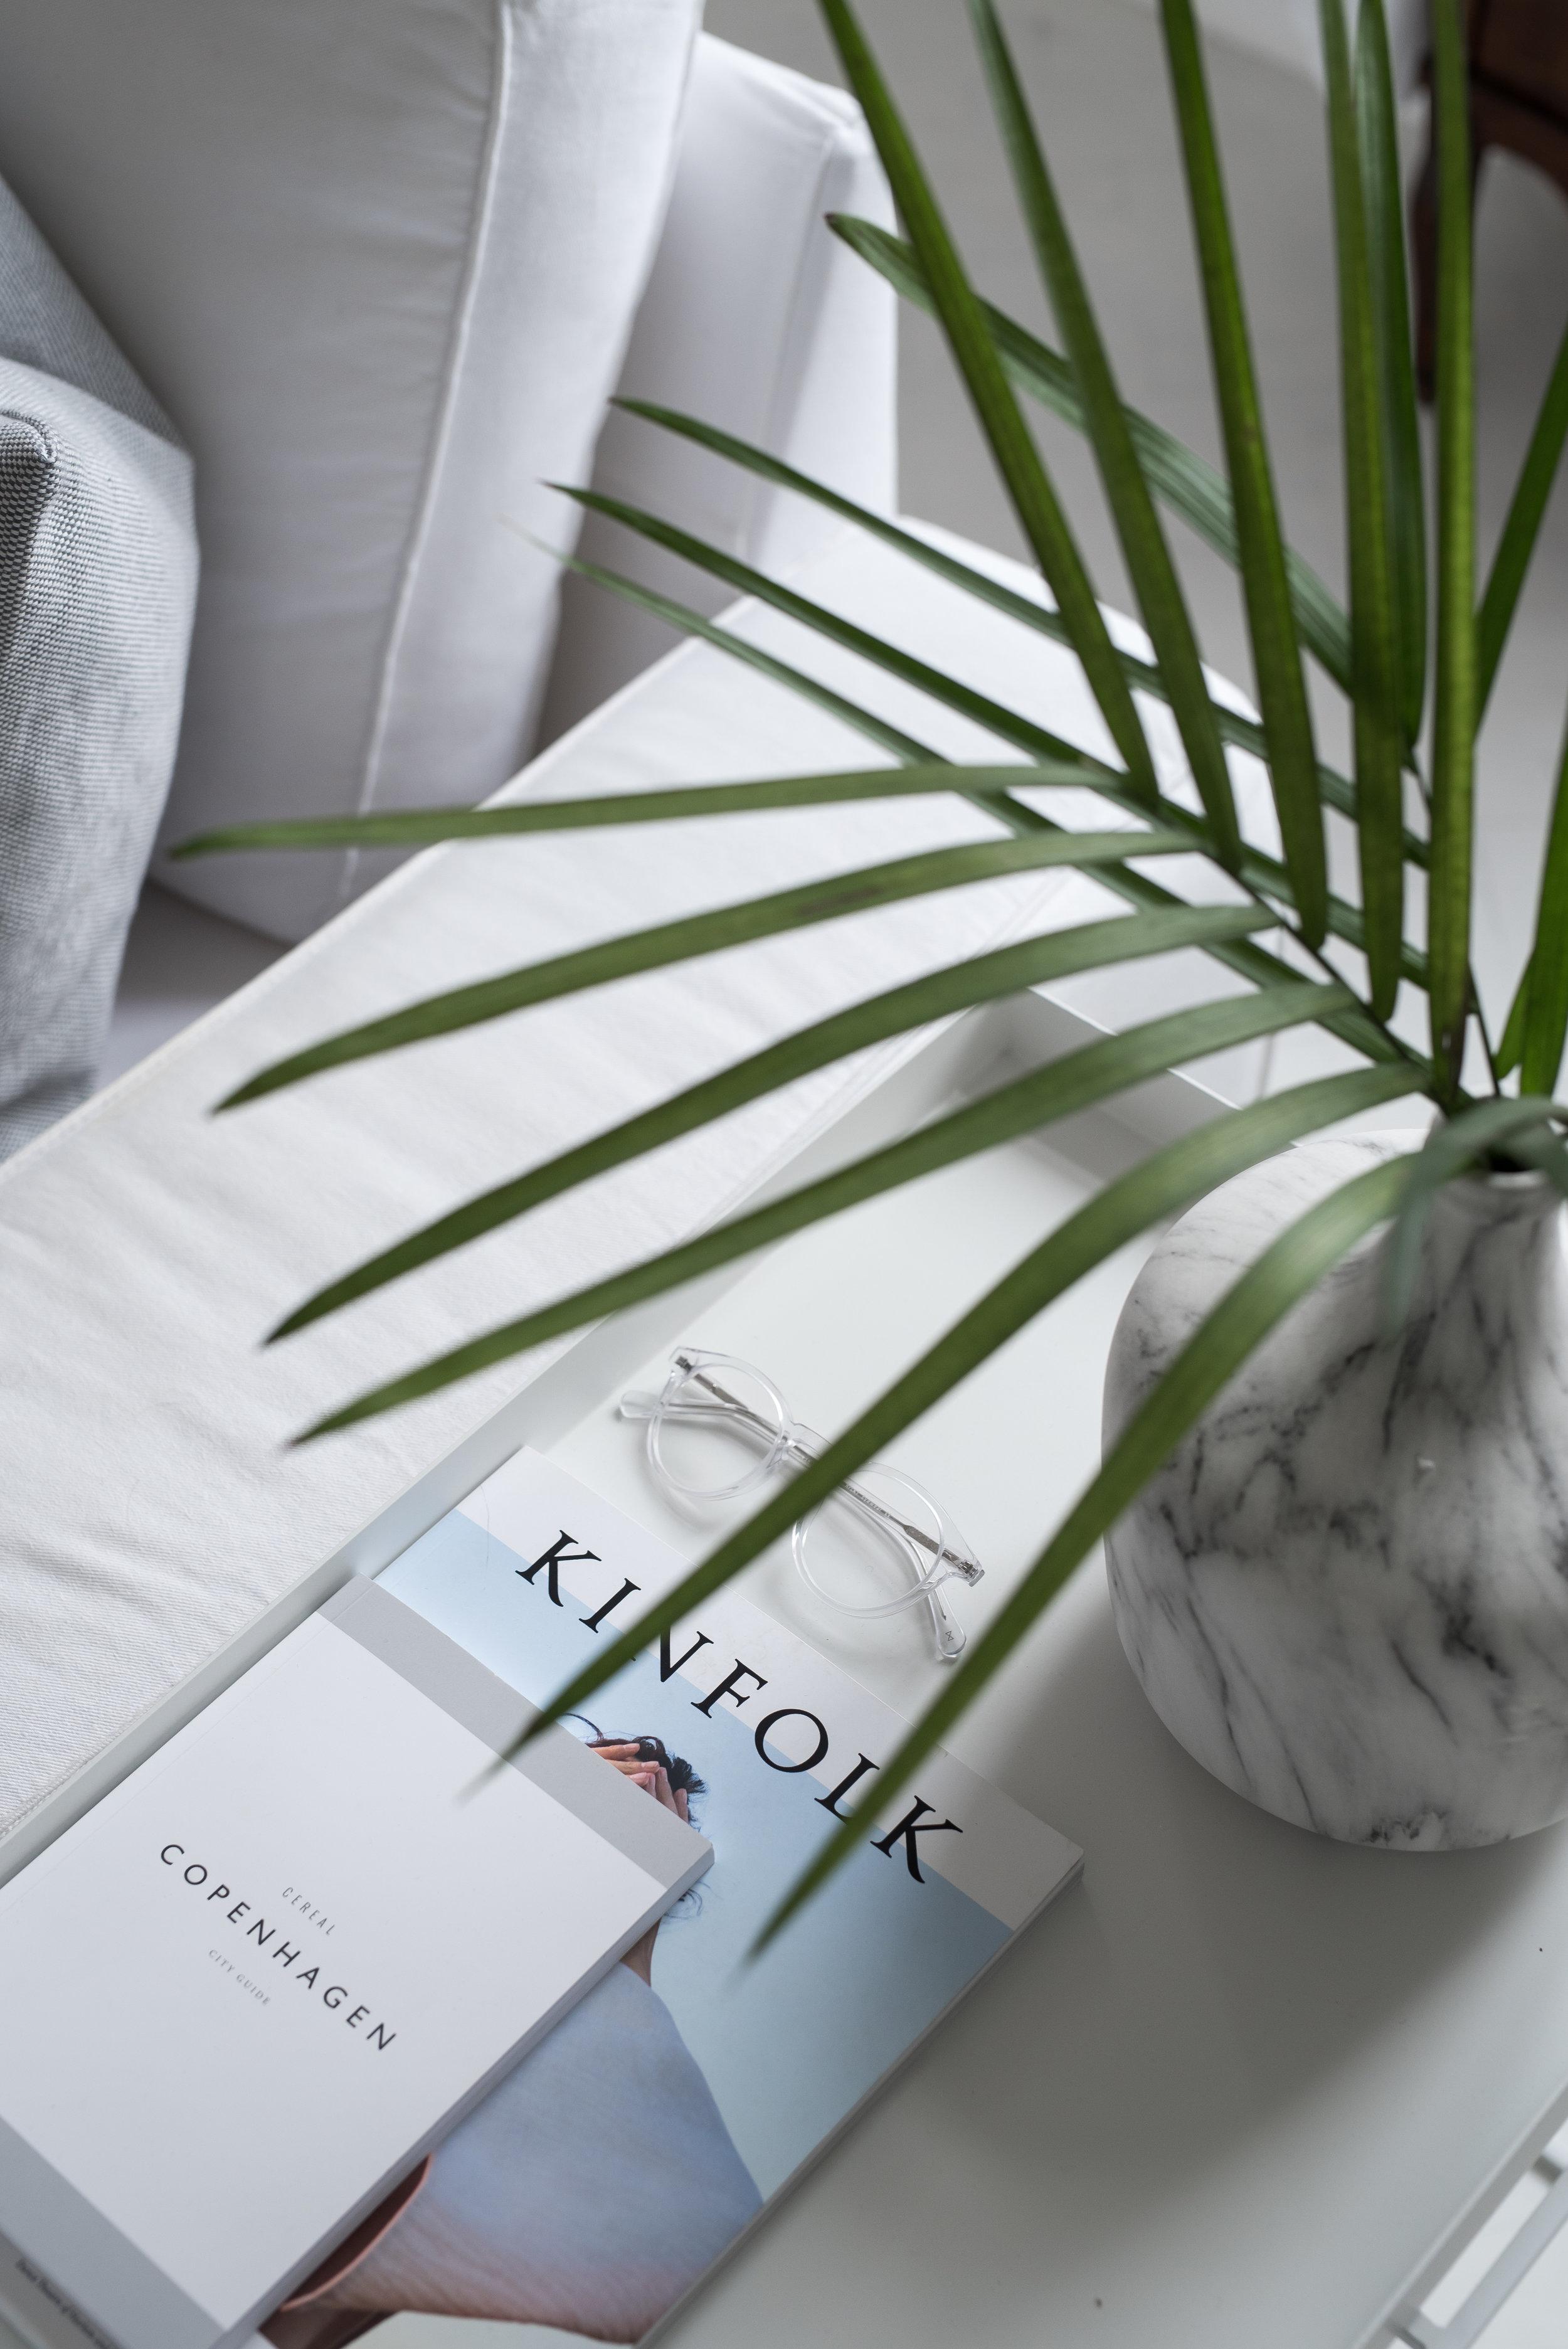 Marble Vase, Kinfolk and Eyebuydirect glasses